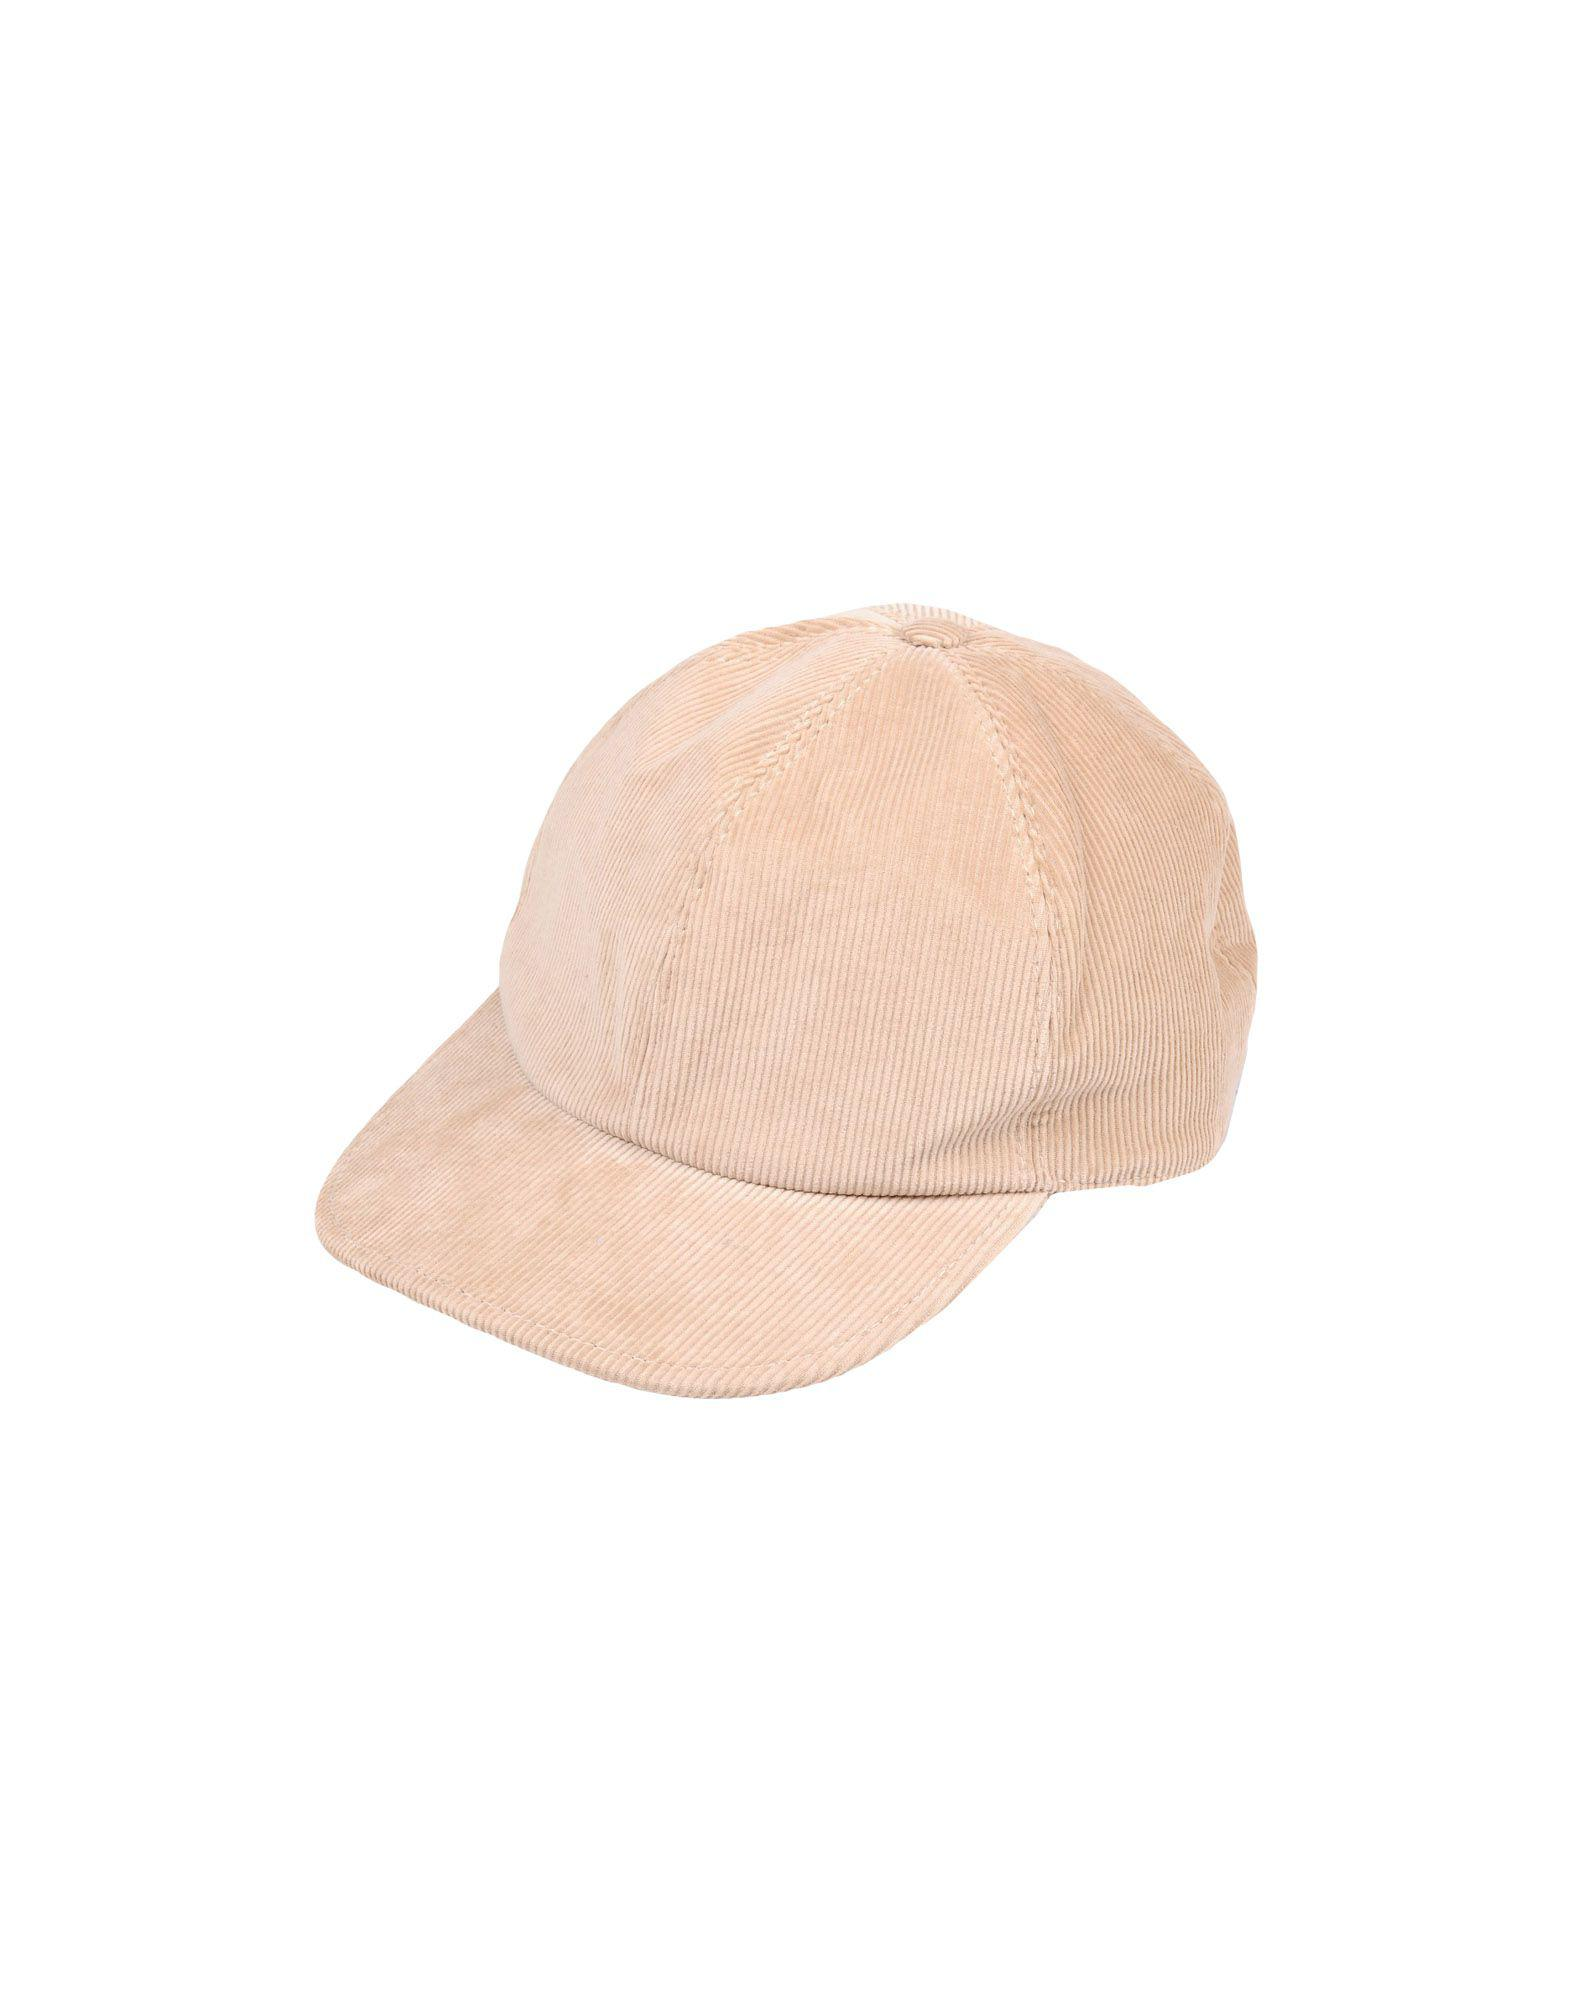 bd1befc1cc1 Lyst - Brunello Cucinelli Hat in Natural for Men